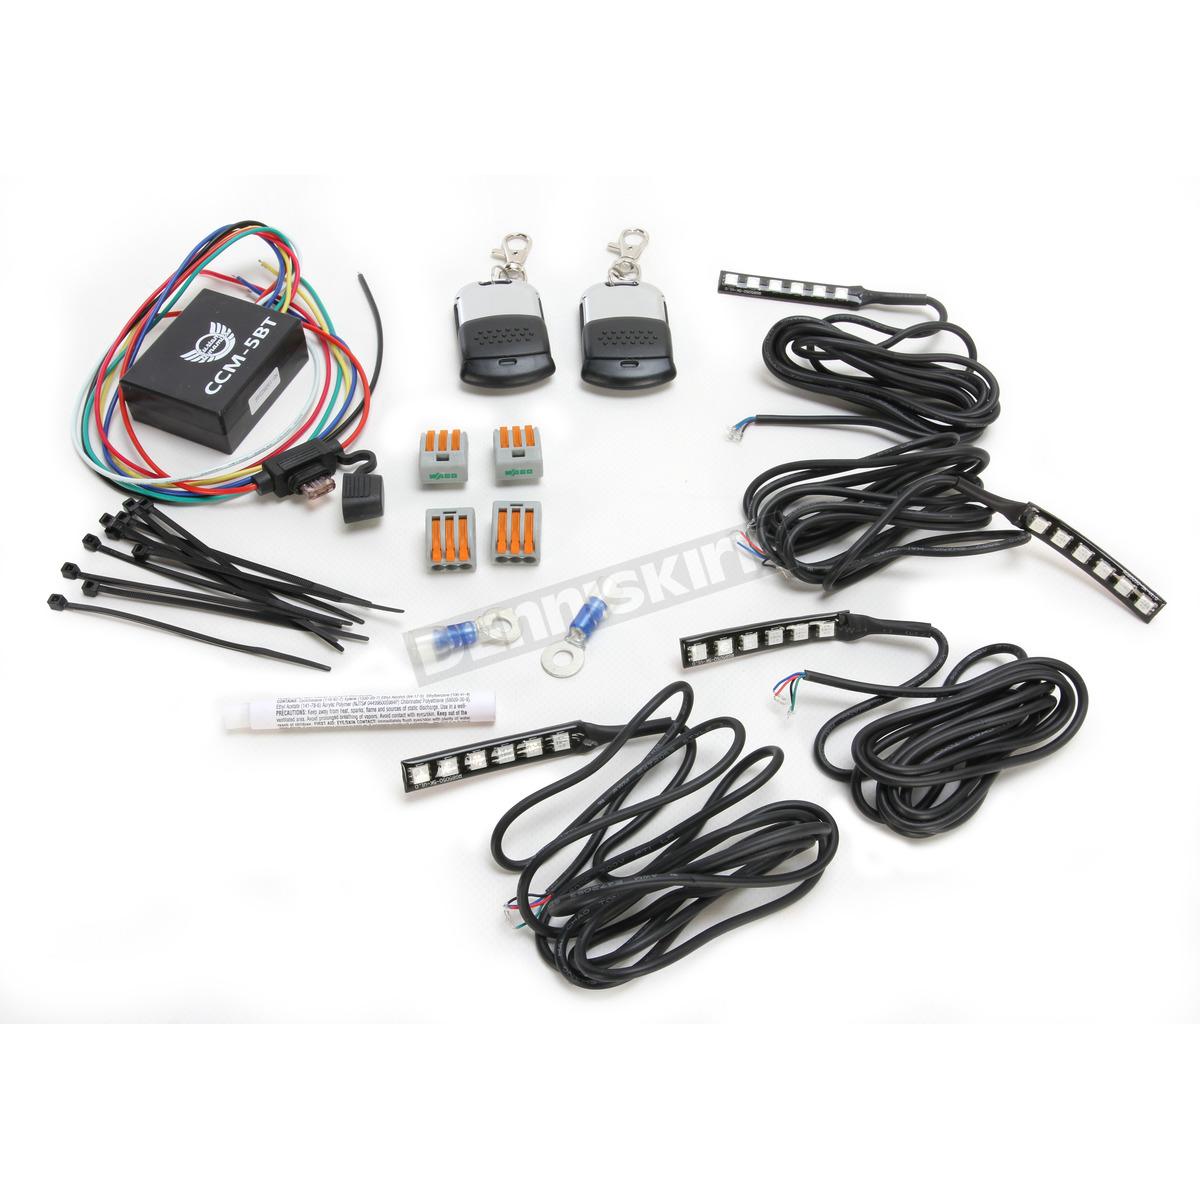 Custom Dynamics Slimline Magical Wizard Light Starter Kit W Bluetooth Color Command 5 Led Remote